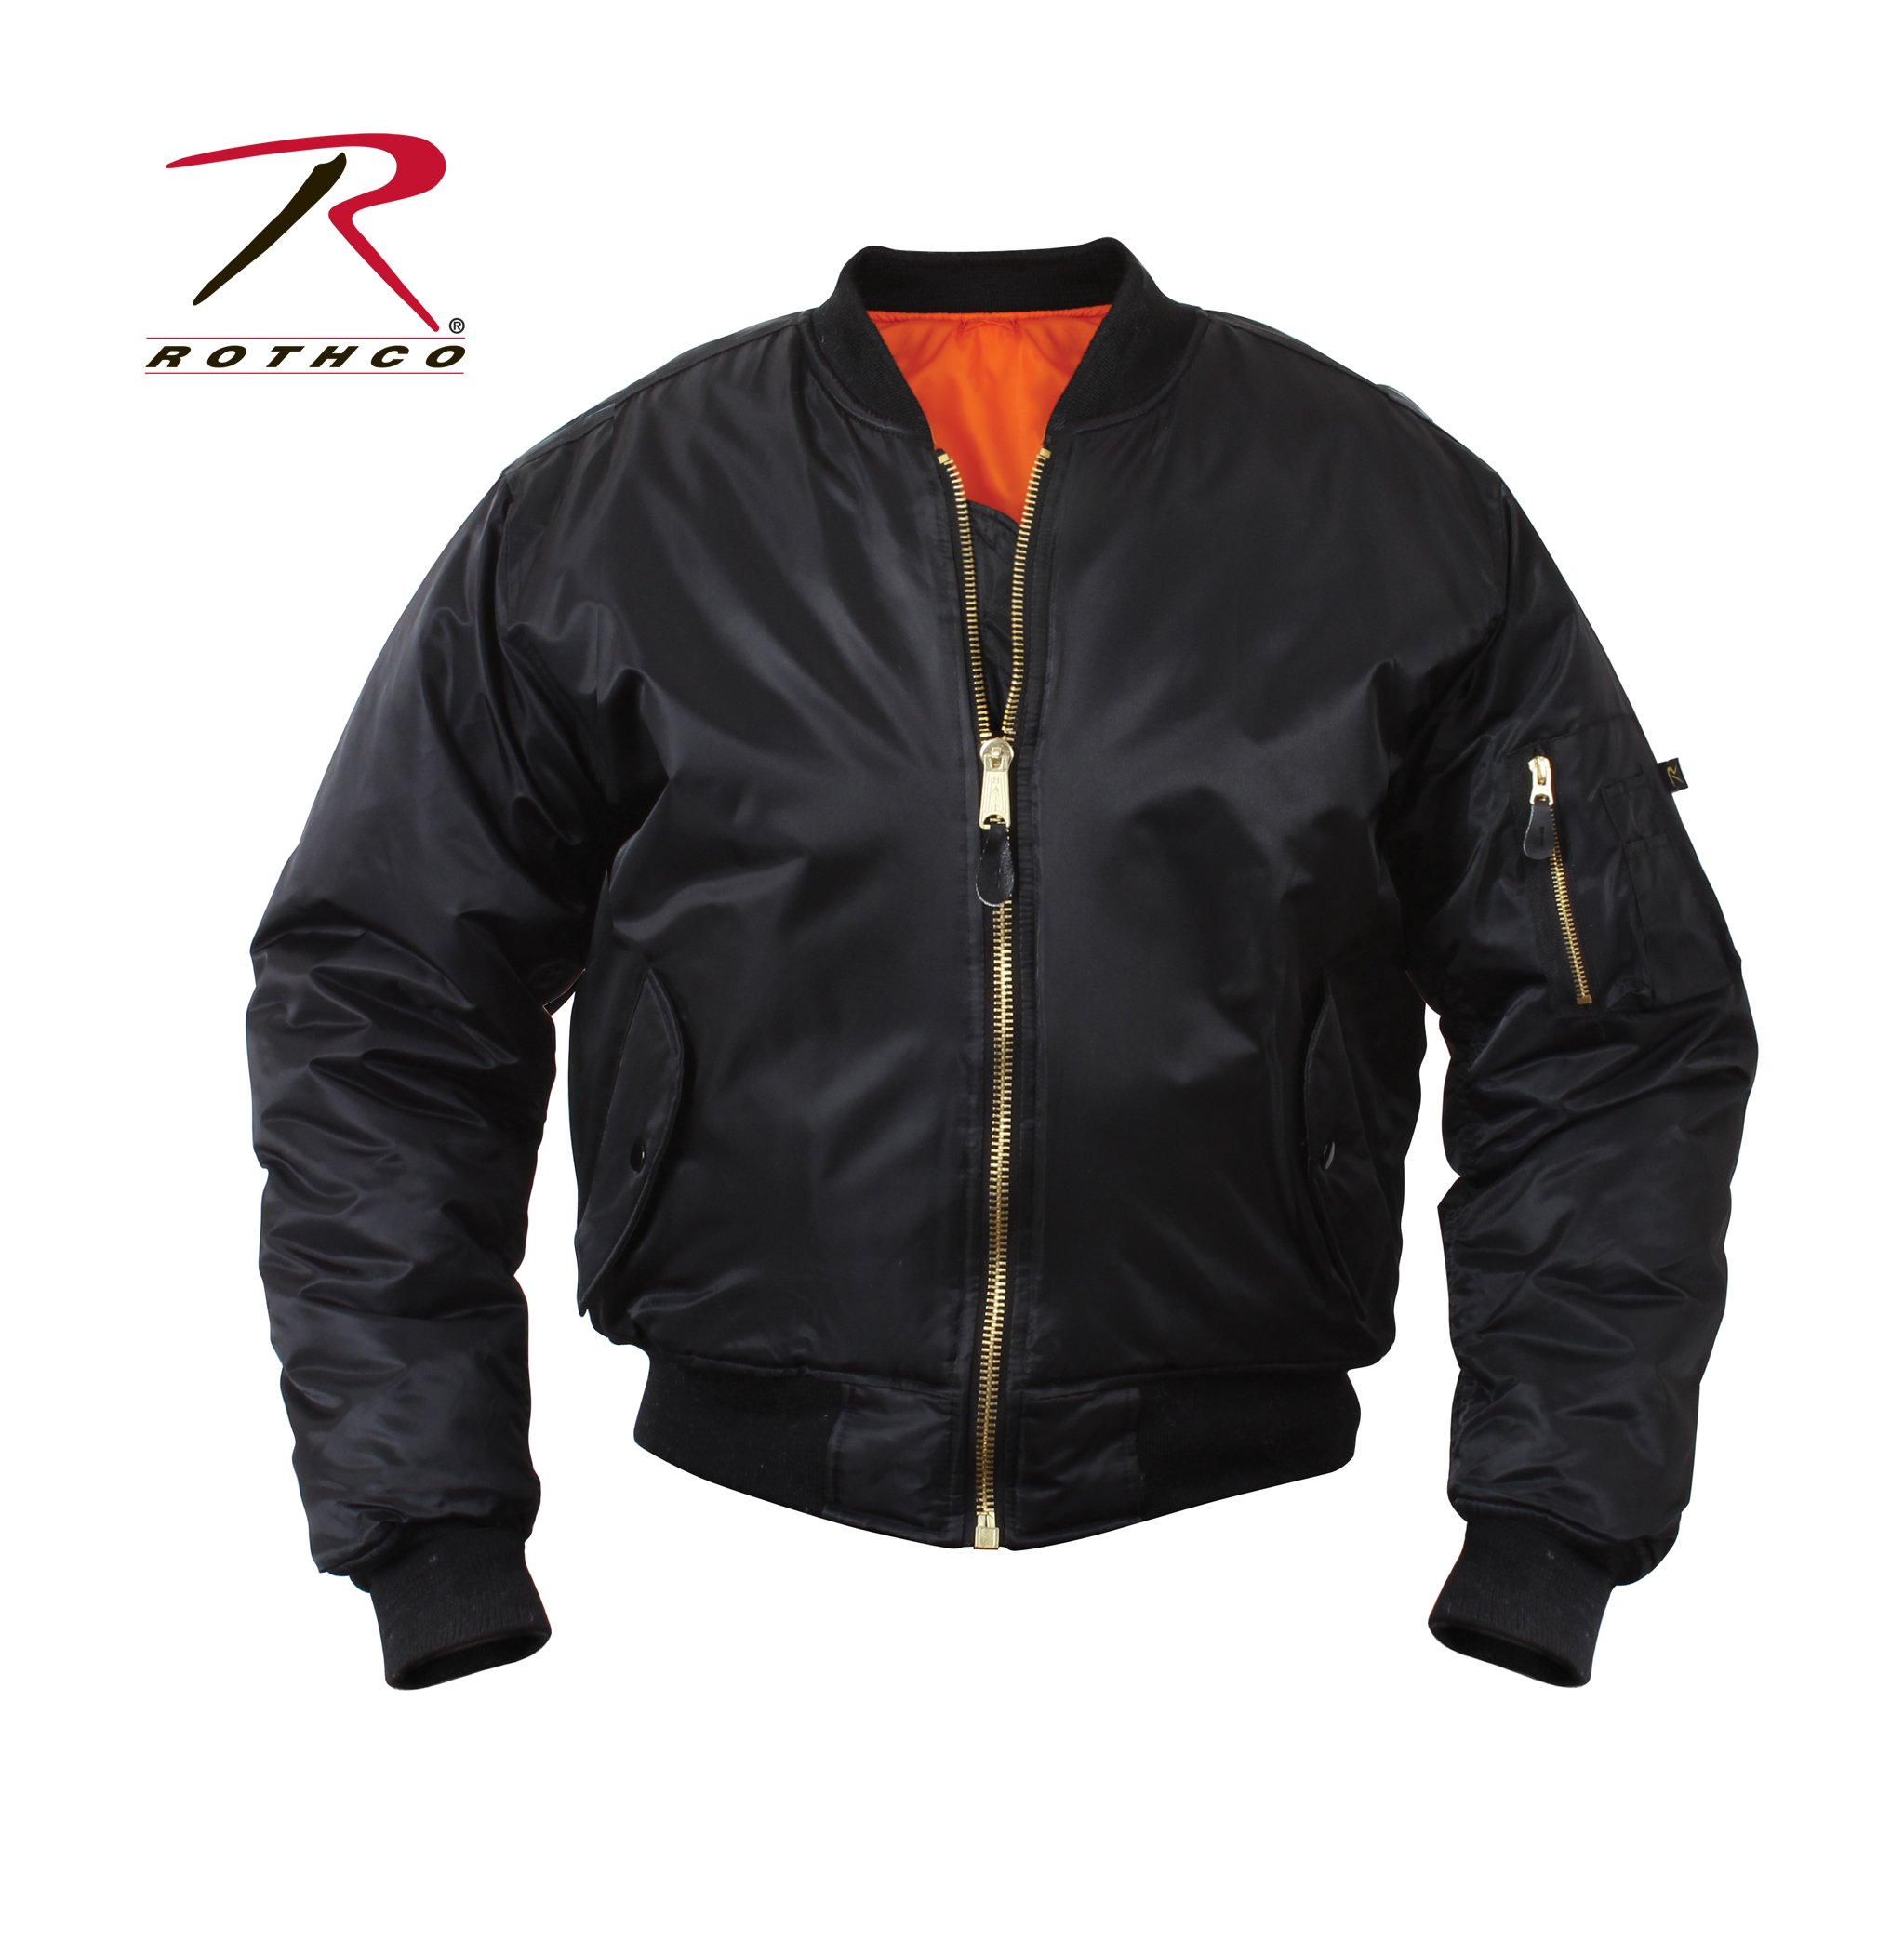 Rothco Kids Ma-1 Flight Jacket-Black, Medium